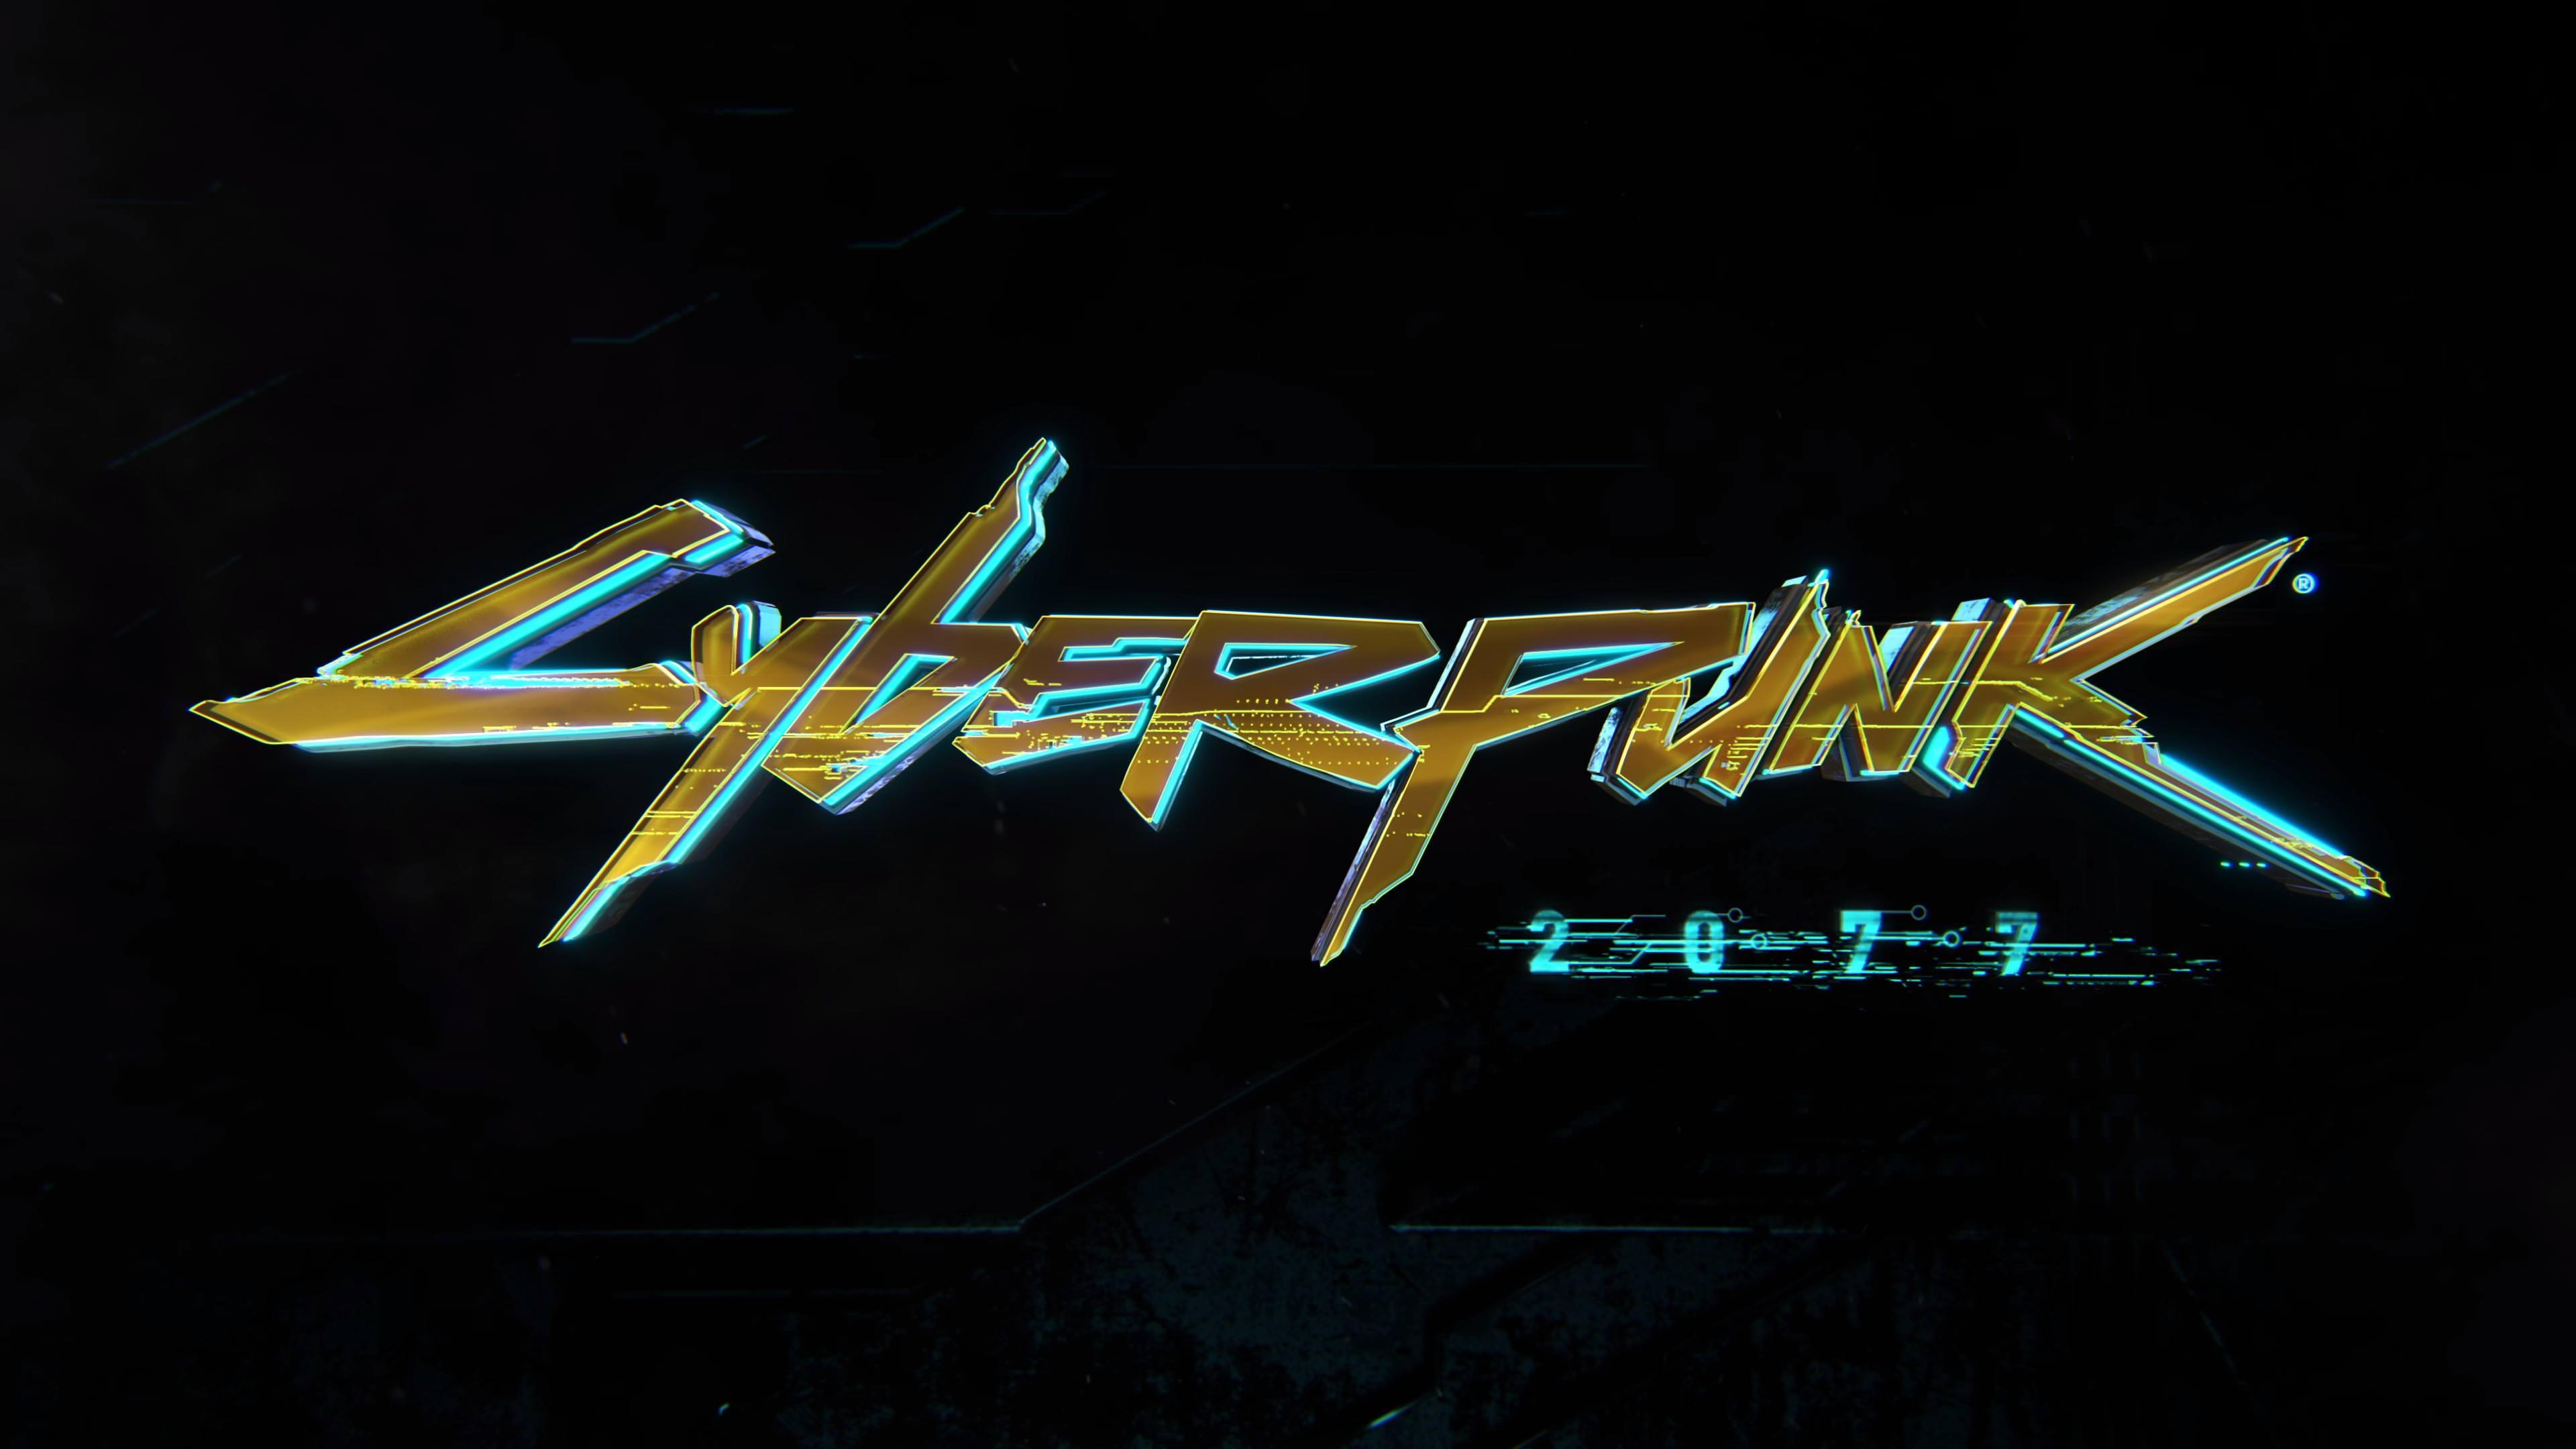 Steam Workshop Cyberpunk 2077 Wallpaper 4kanimated